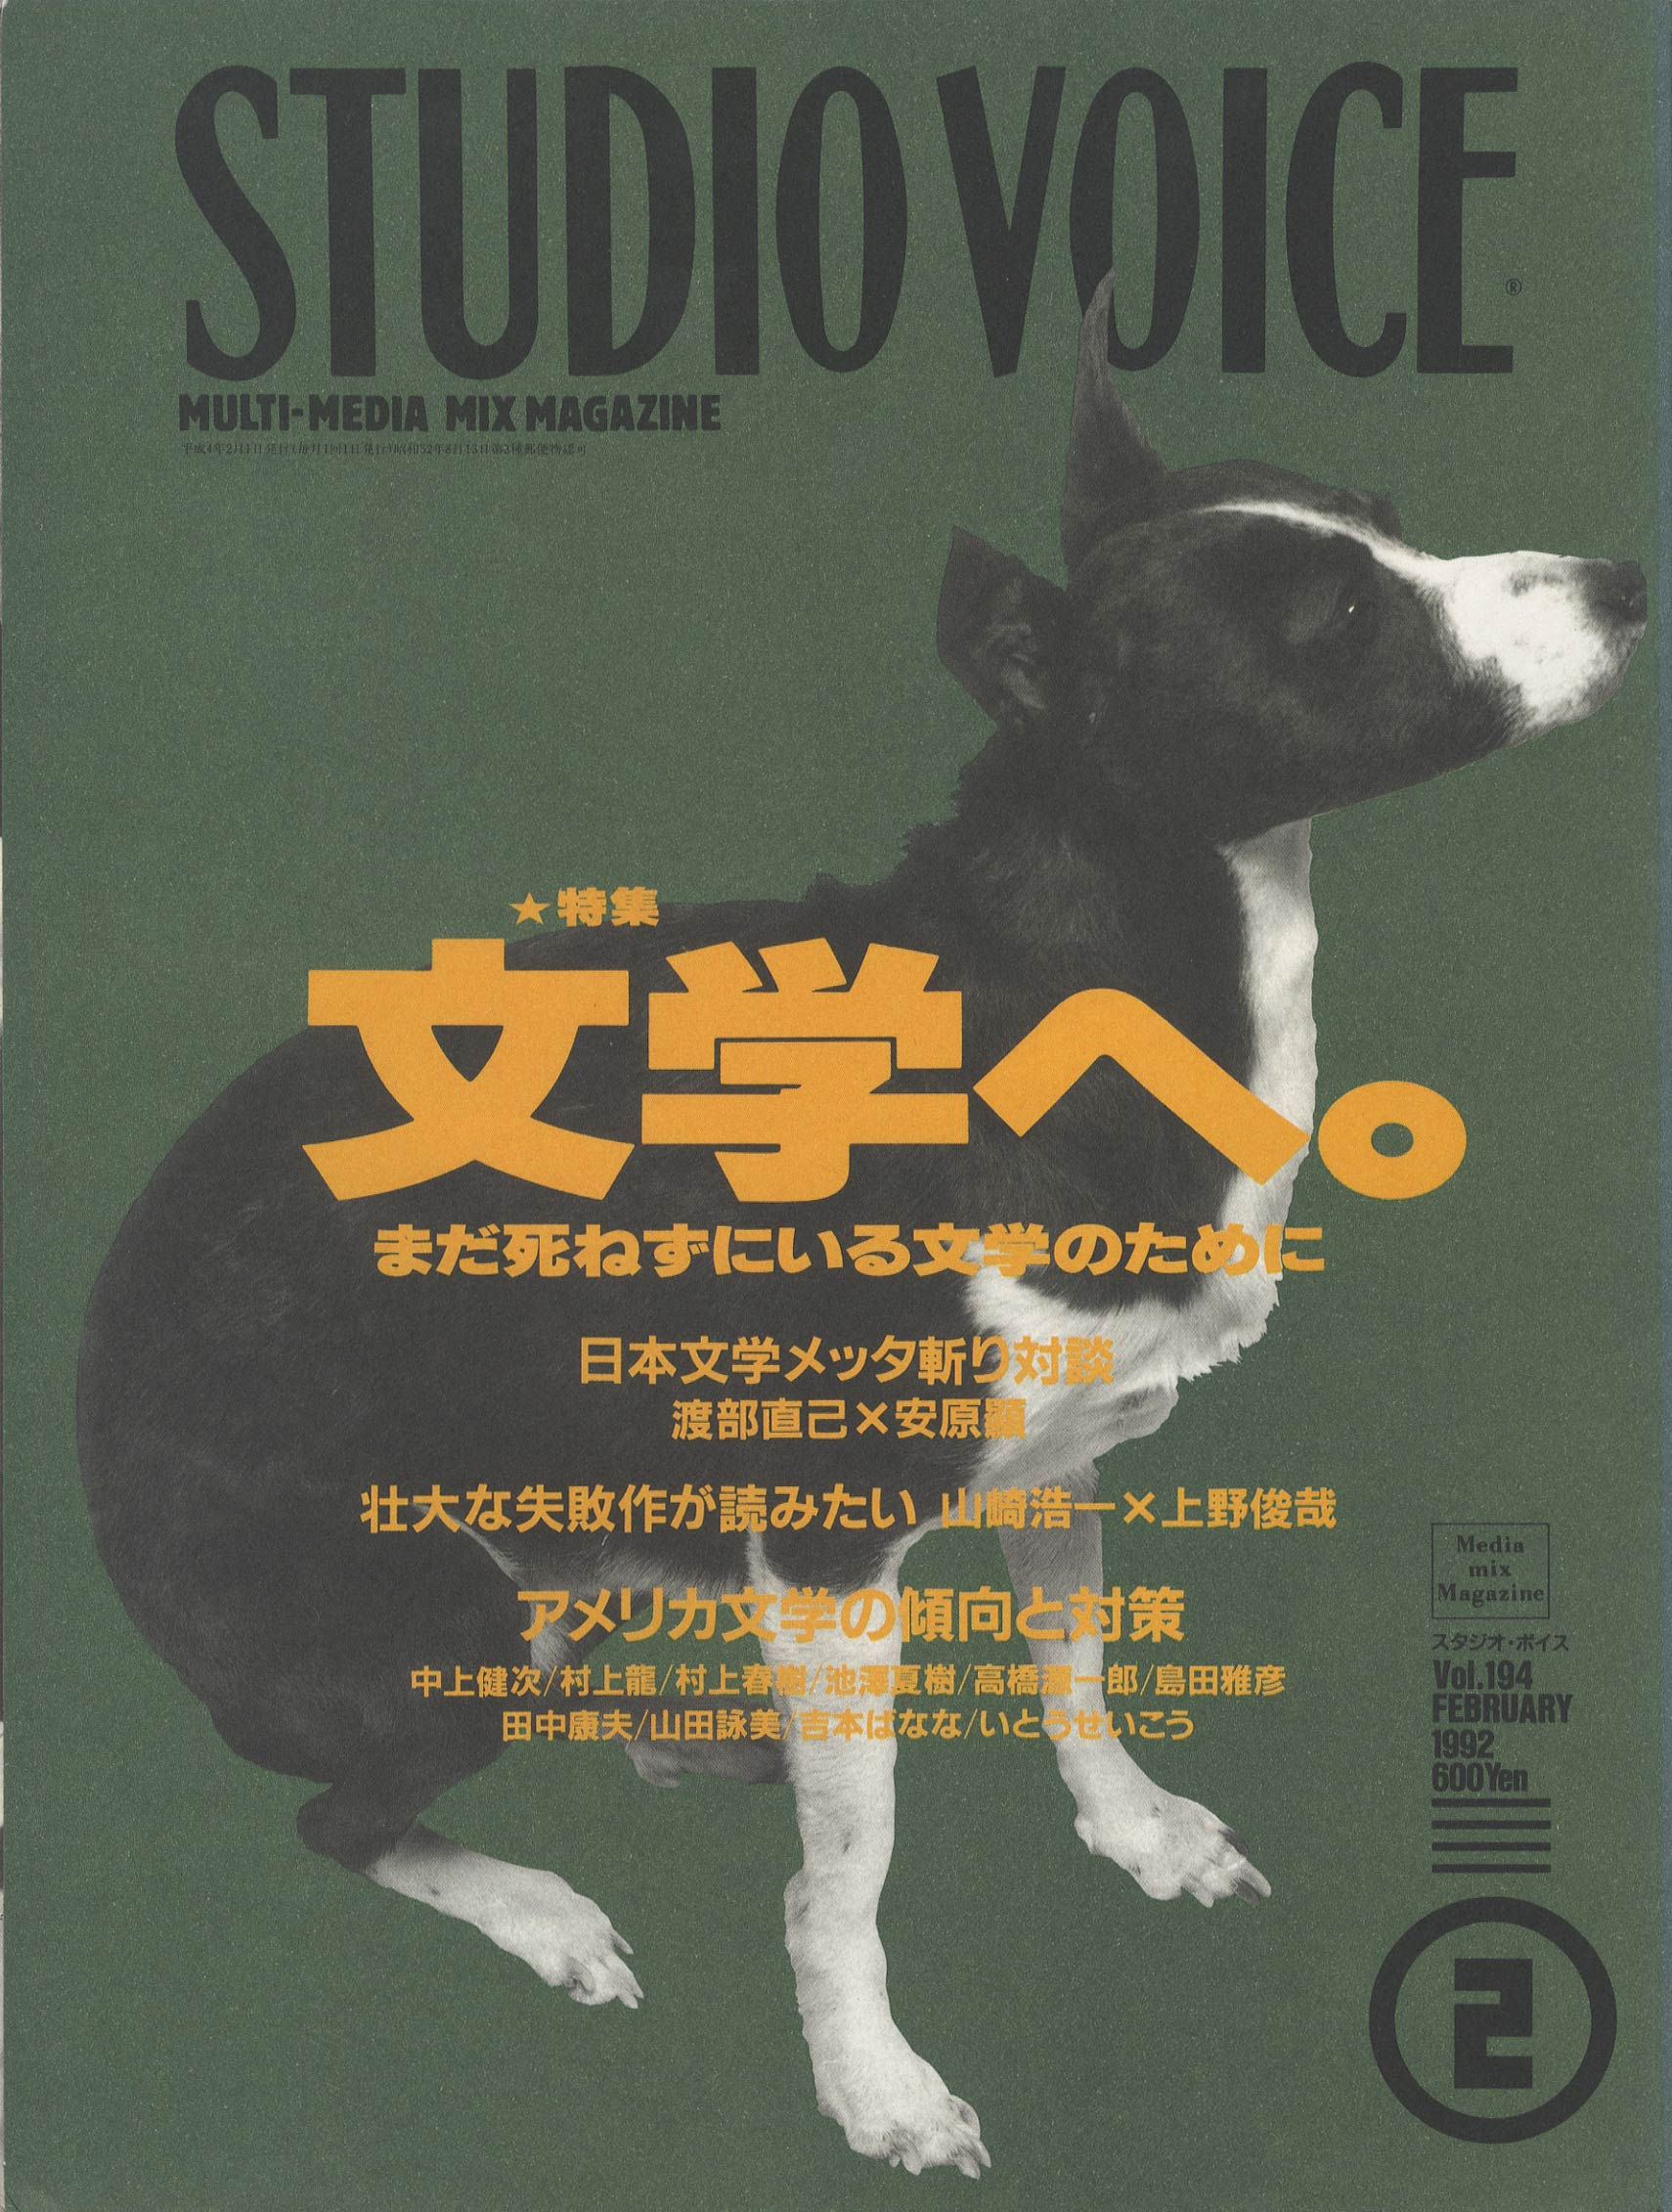 STUDIO VOICE MULTI-MEDIA MIX MAGAZINE / スタジオ・ボイス 1992年2月号 Vol.194